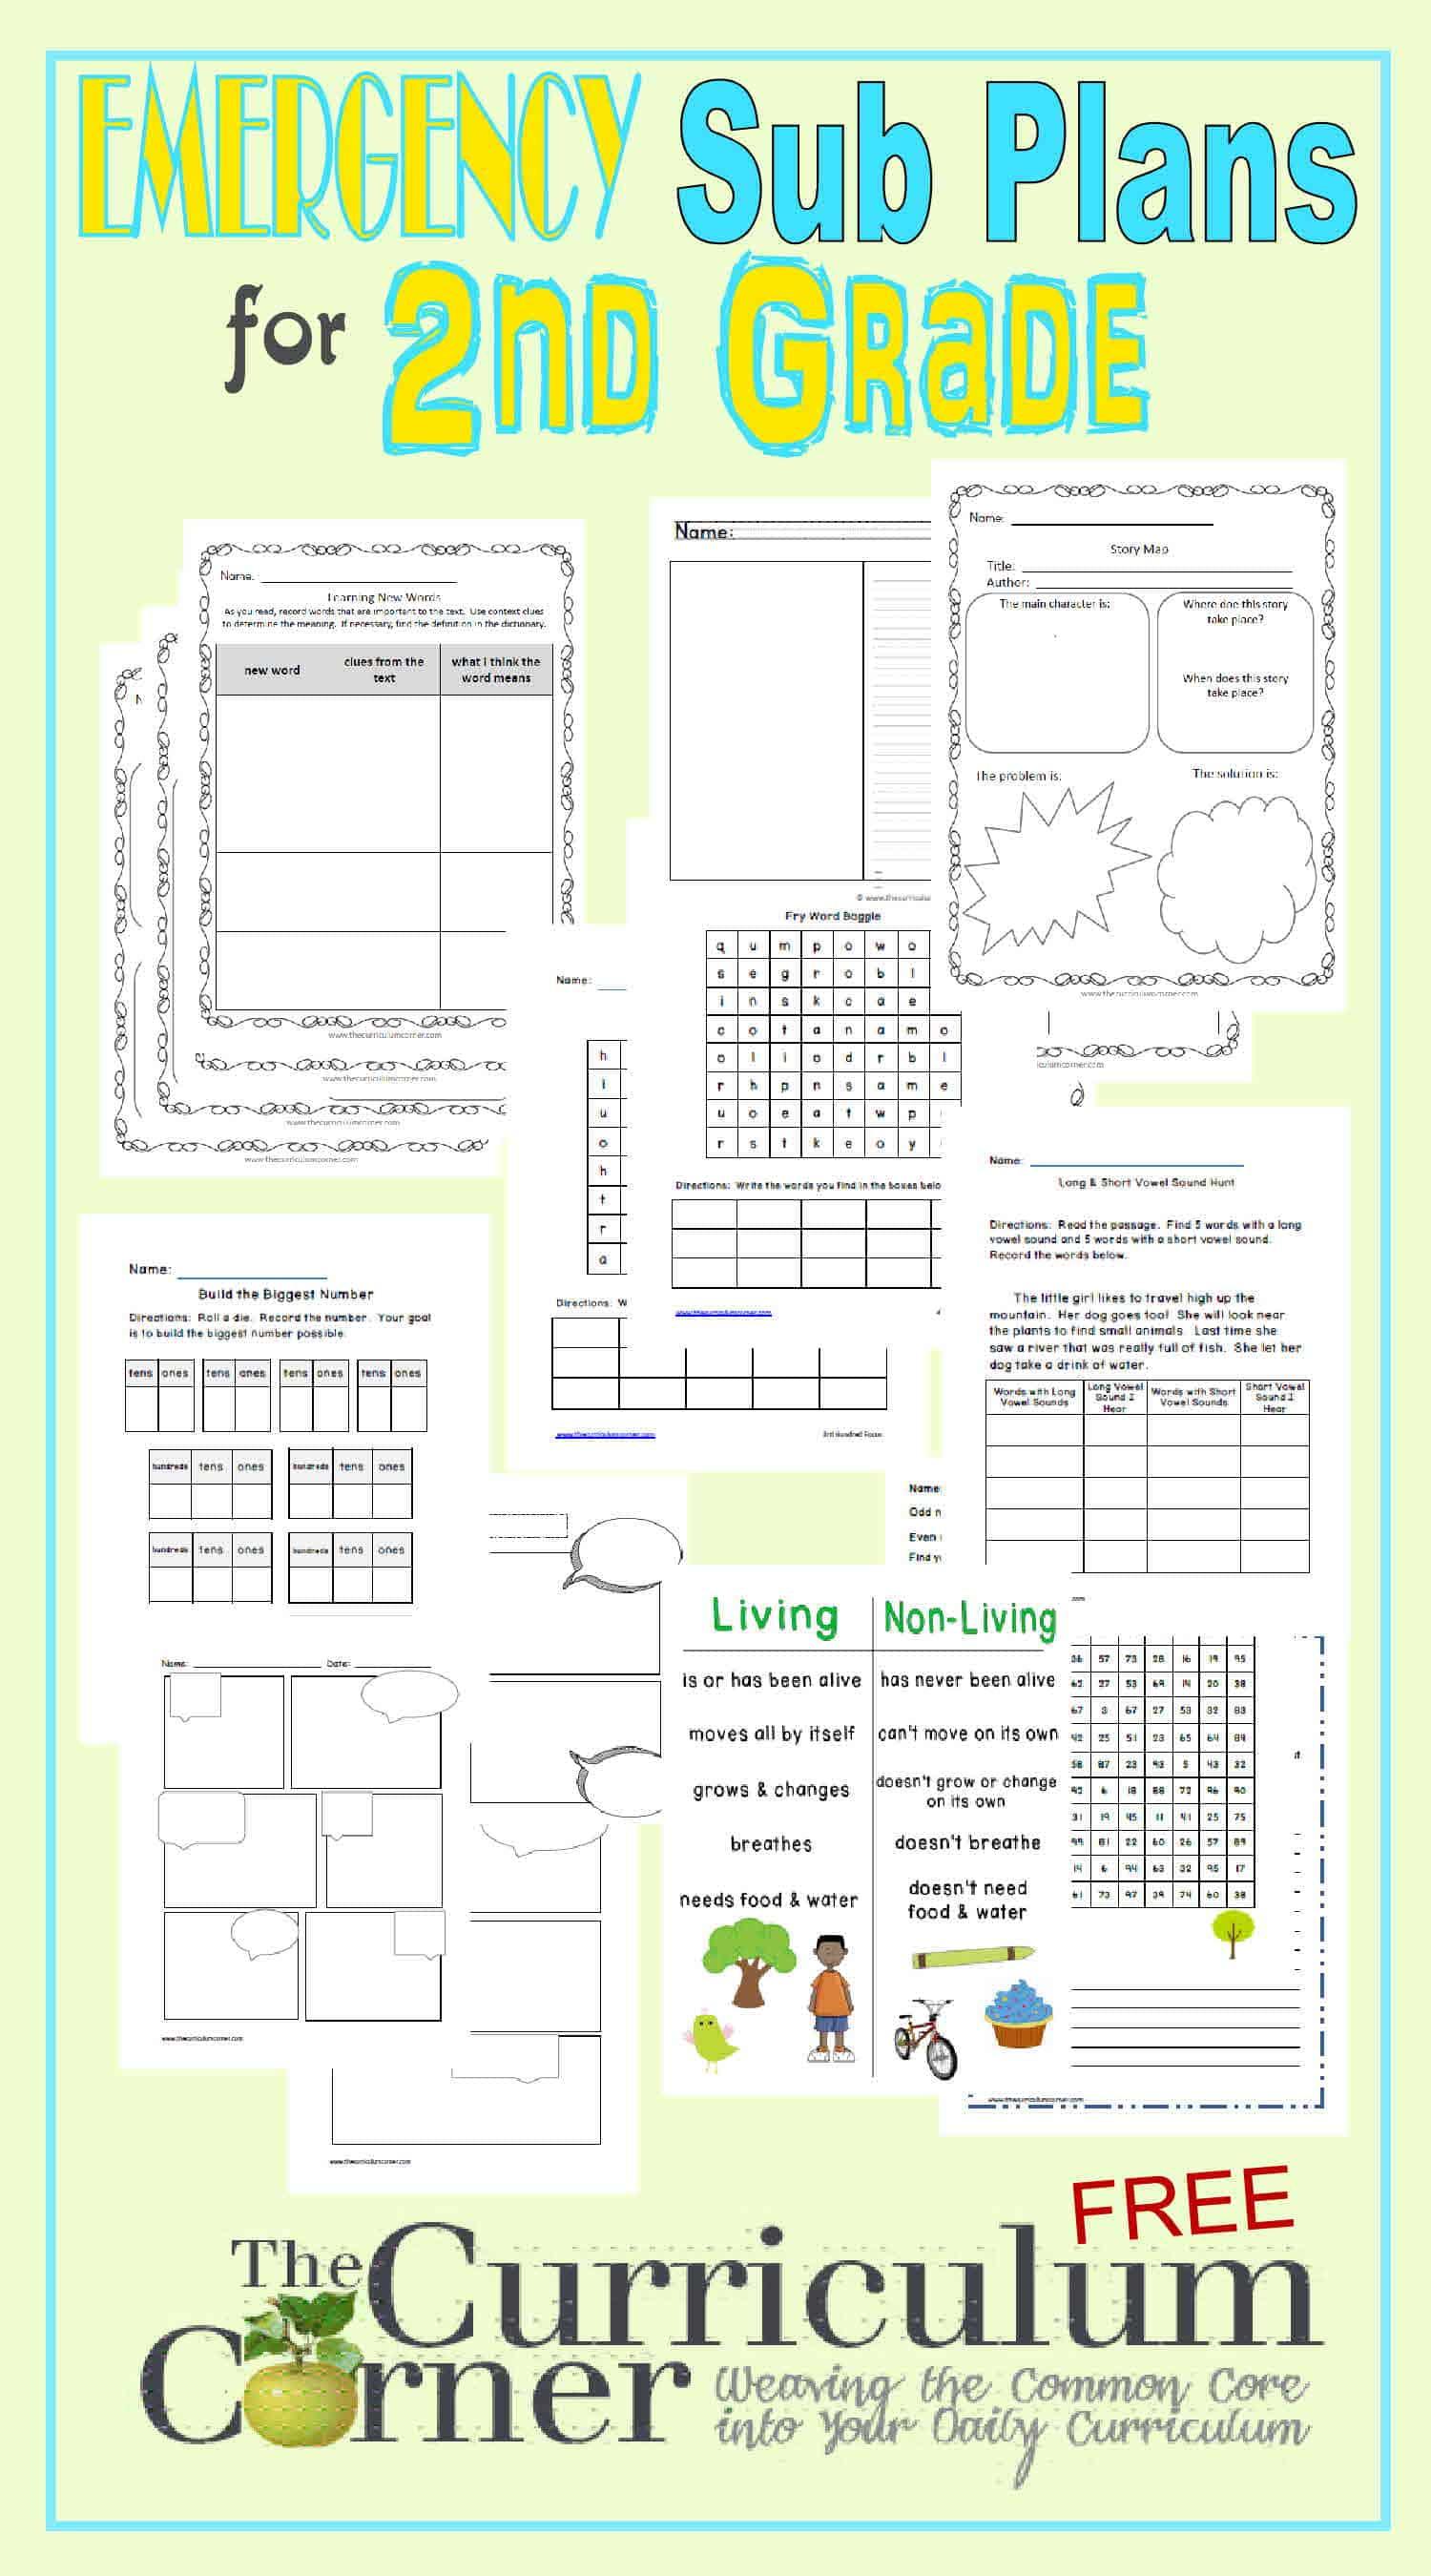 hight resolution of 2nd Grade Emergency Sub Plans - The Curriculum Corner 123